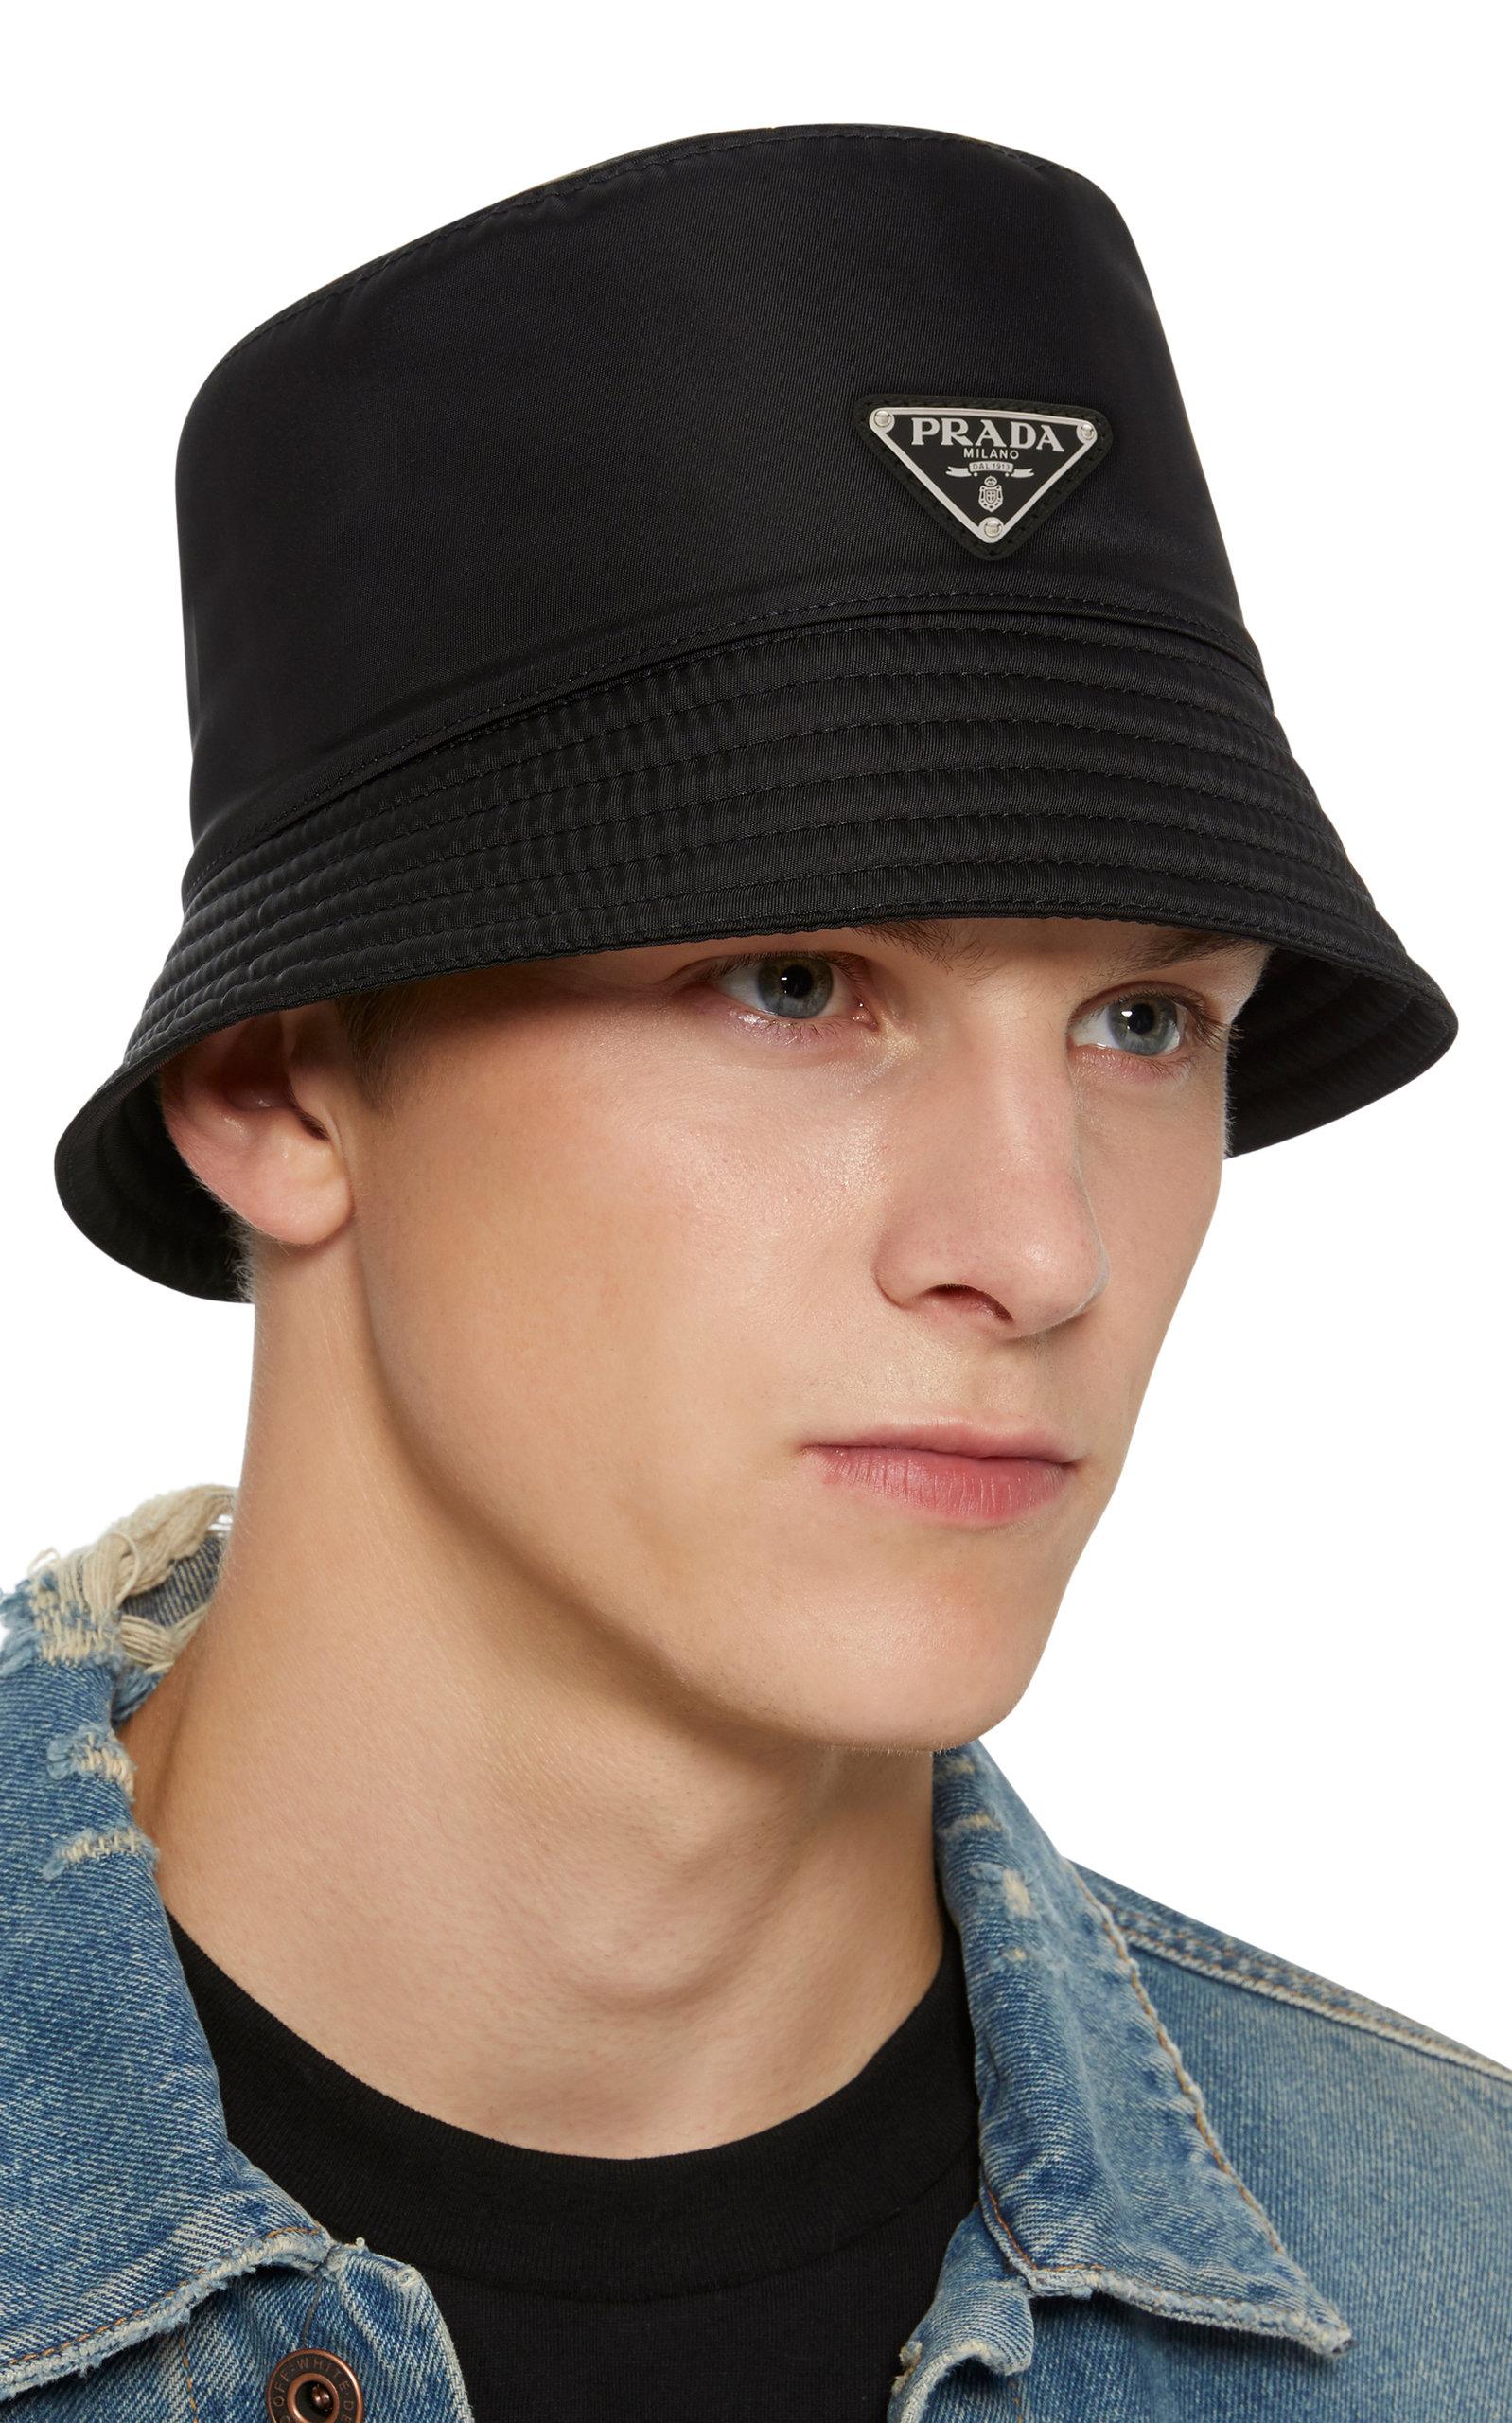 9427f264 Logo-Appliquéd Nylon Bucket Hat by Prada | Moda Operandi